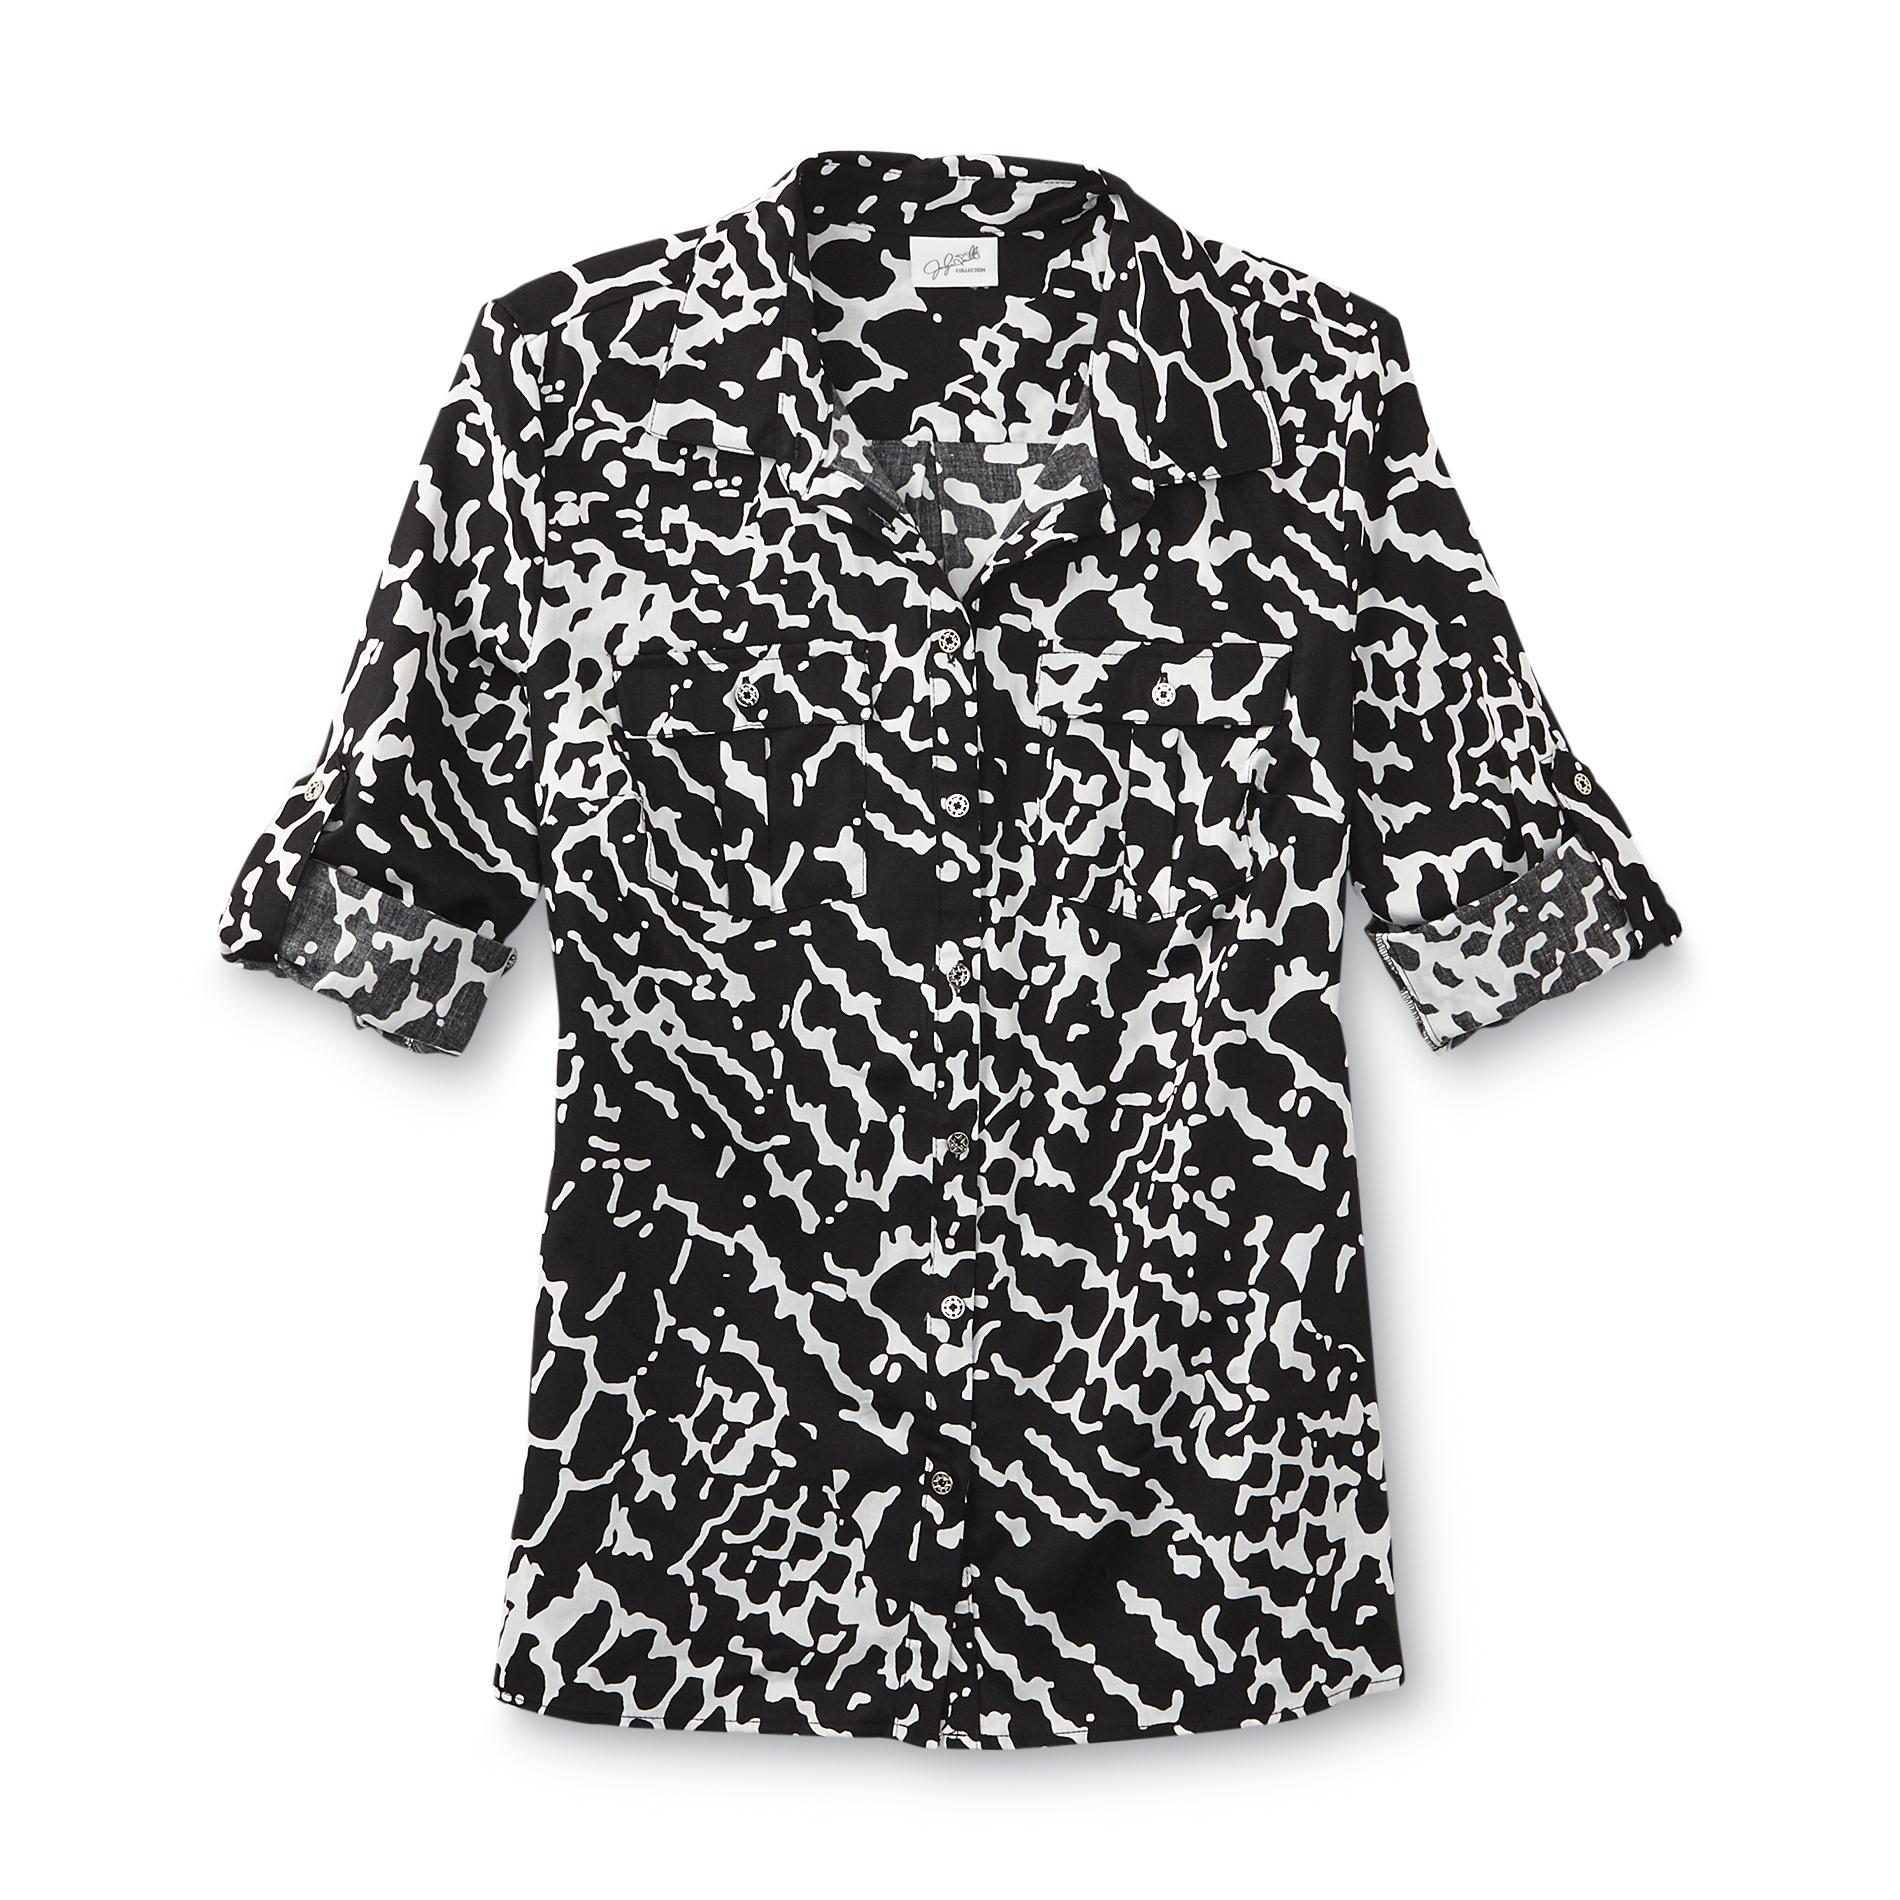 Jaclyn Smith Women's Utility Shirt - Animal Print